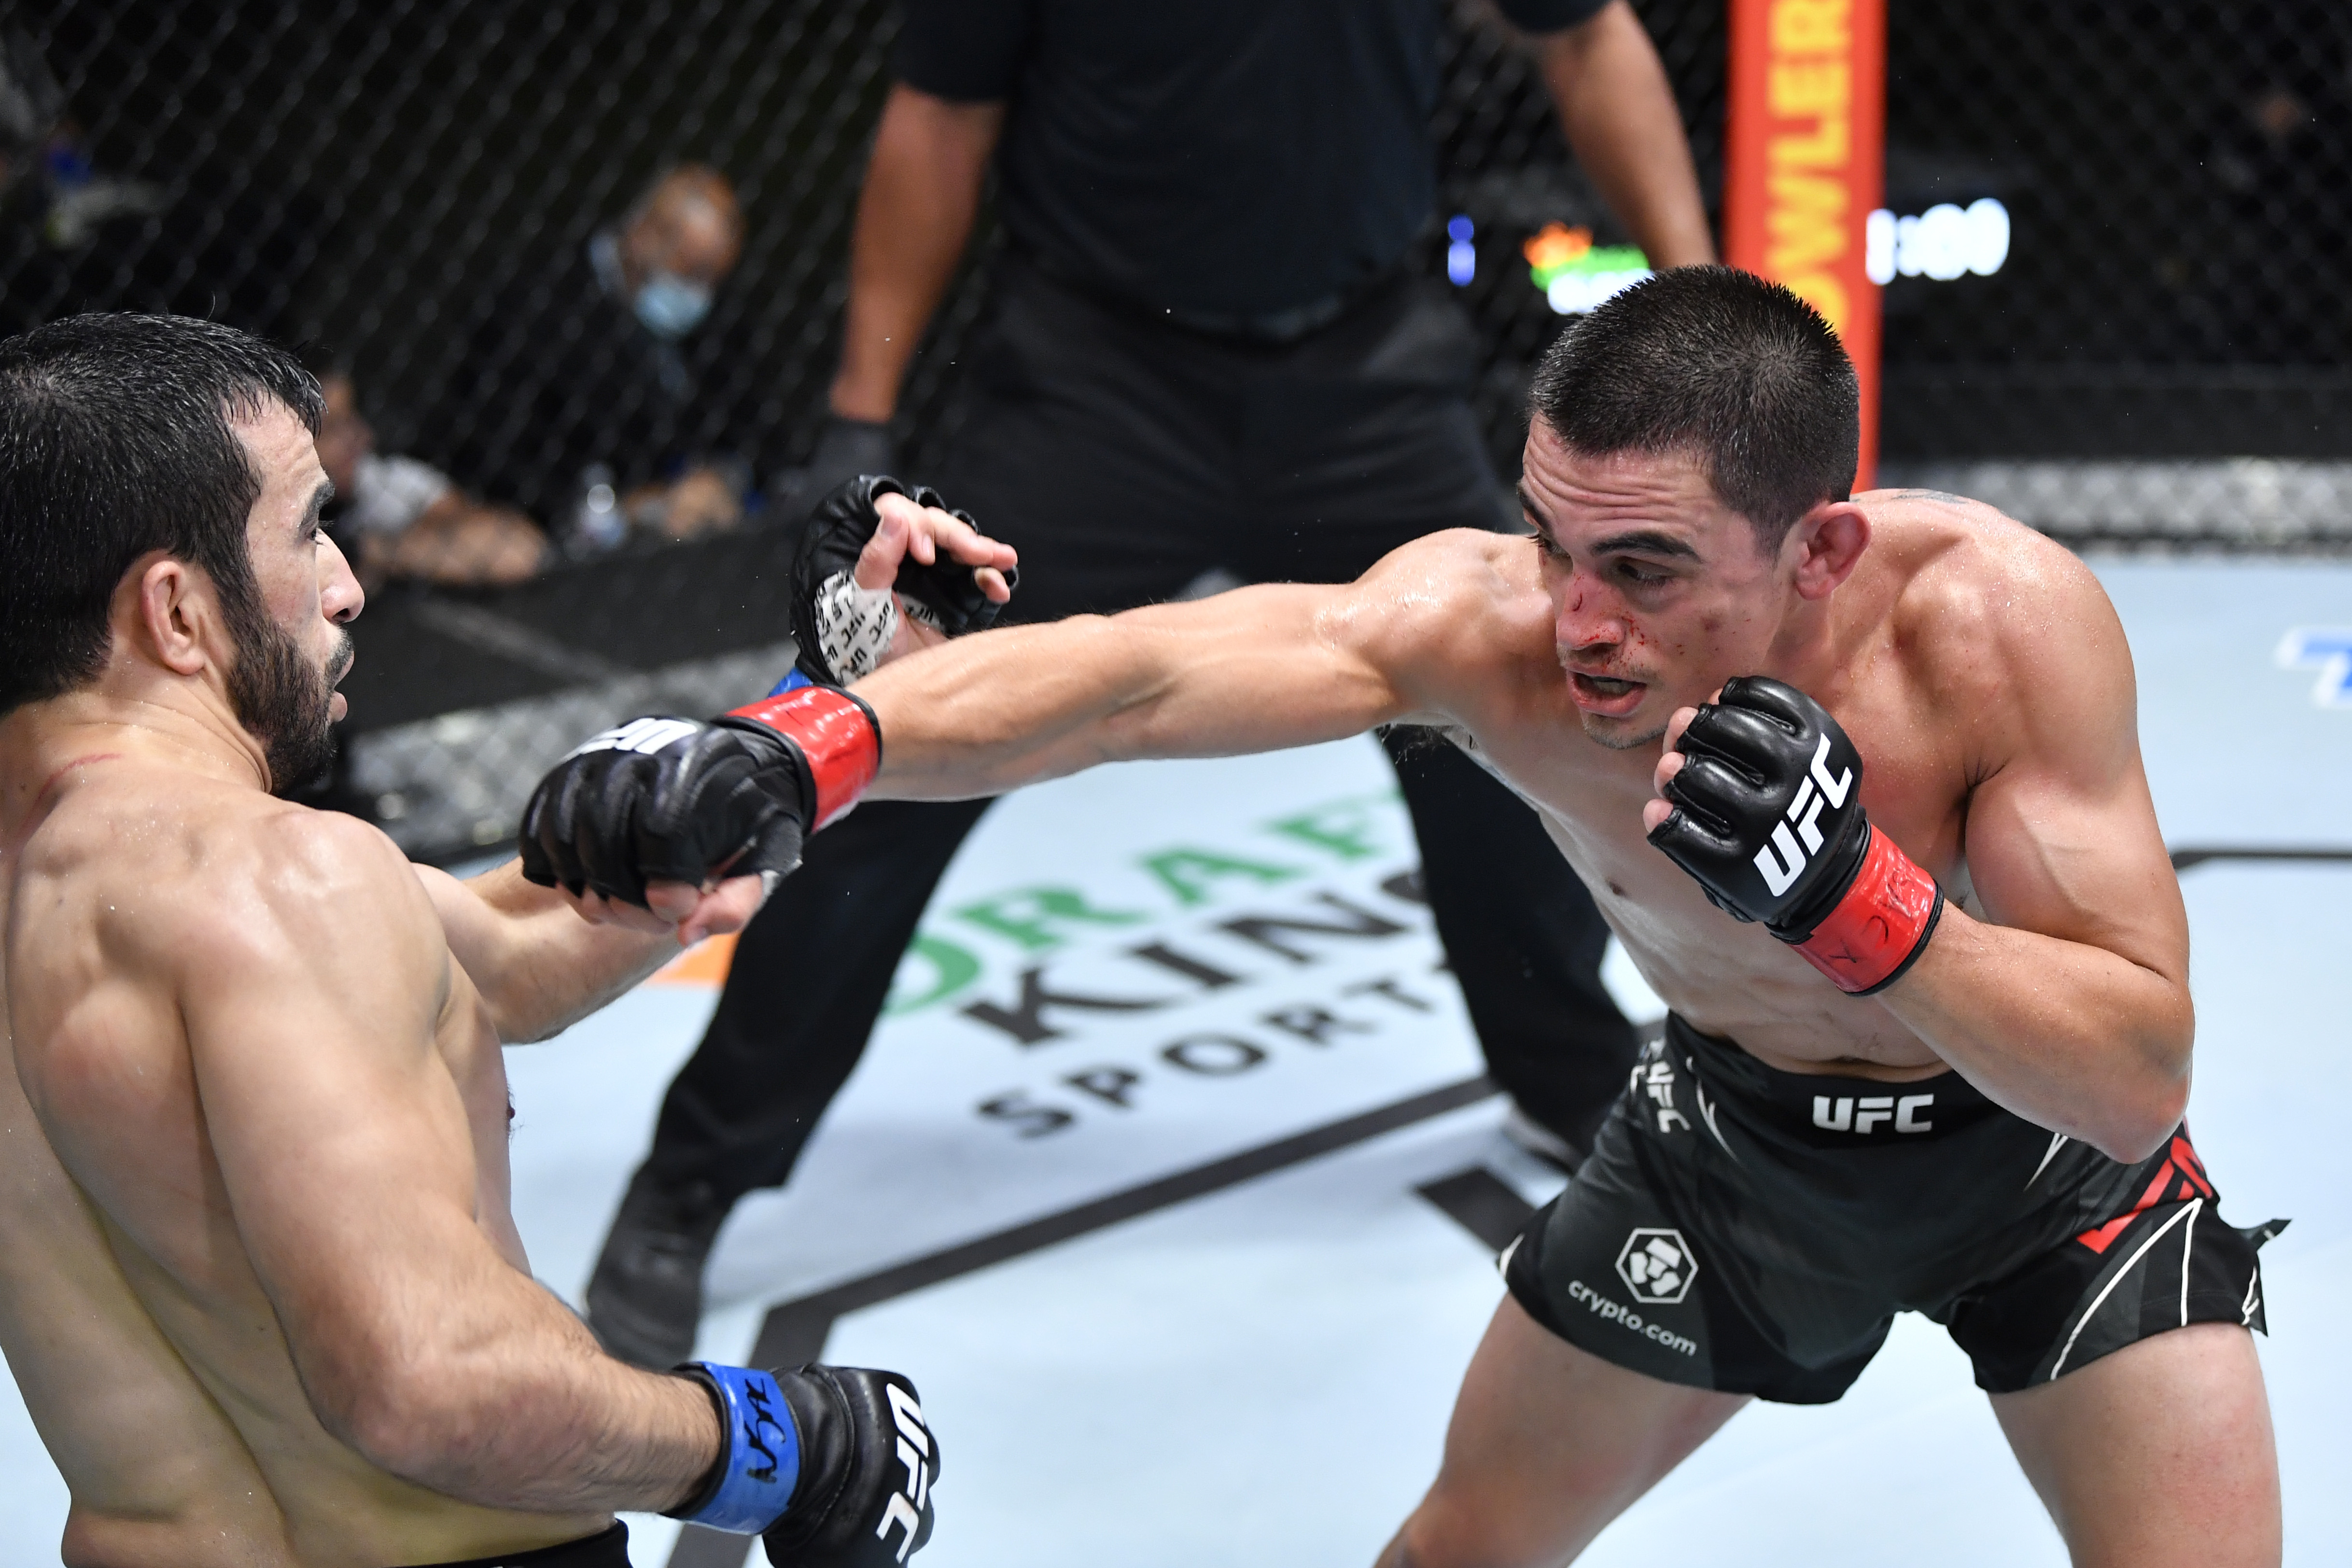 Ryan Benoit during his fight with Zarrukh Adashev at UFC Vegas 33 on Saturday night.